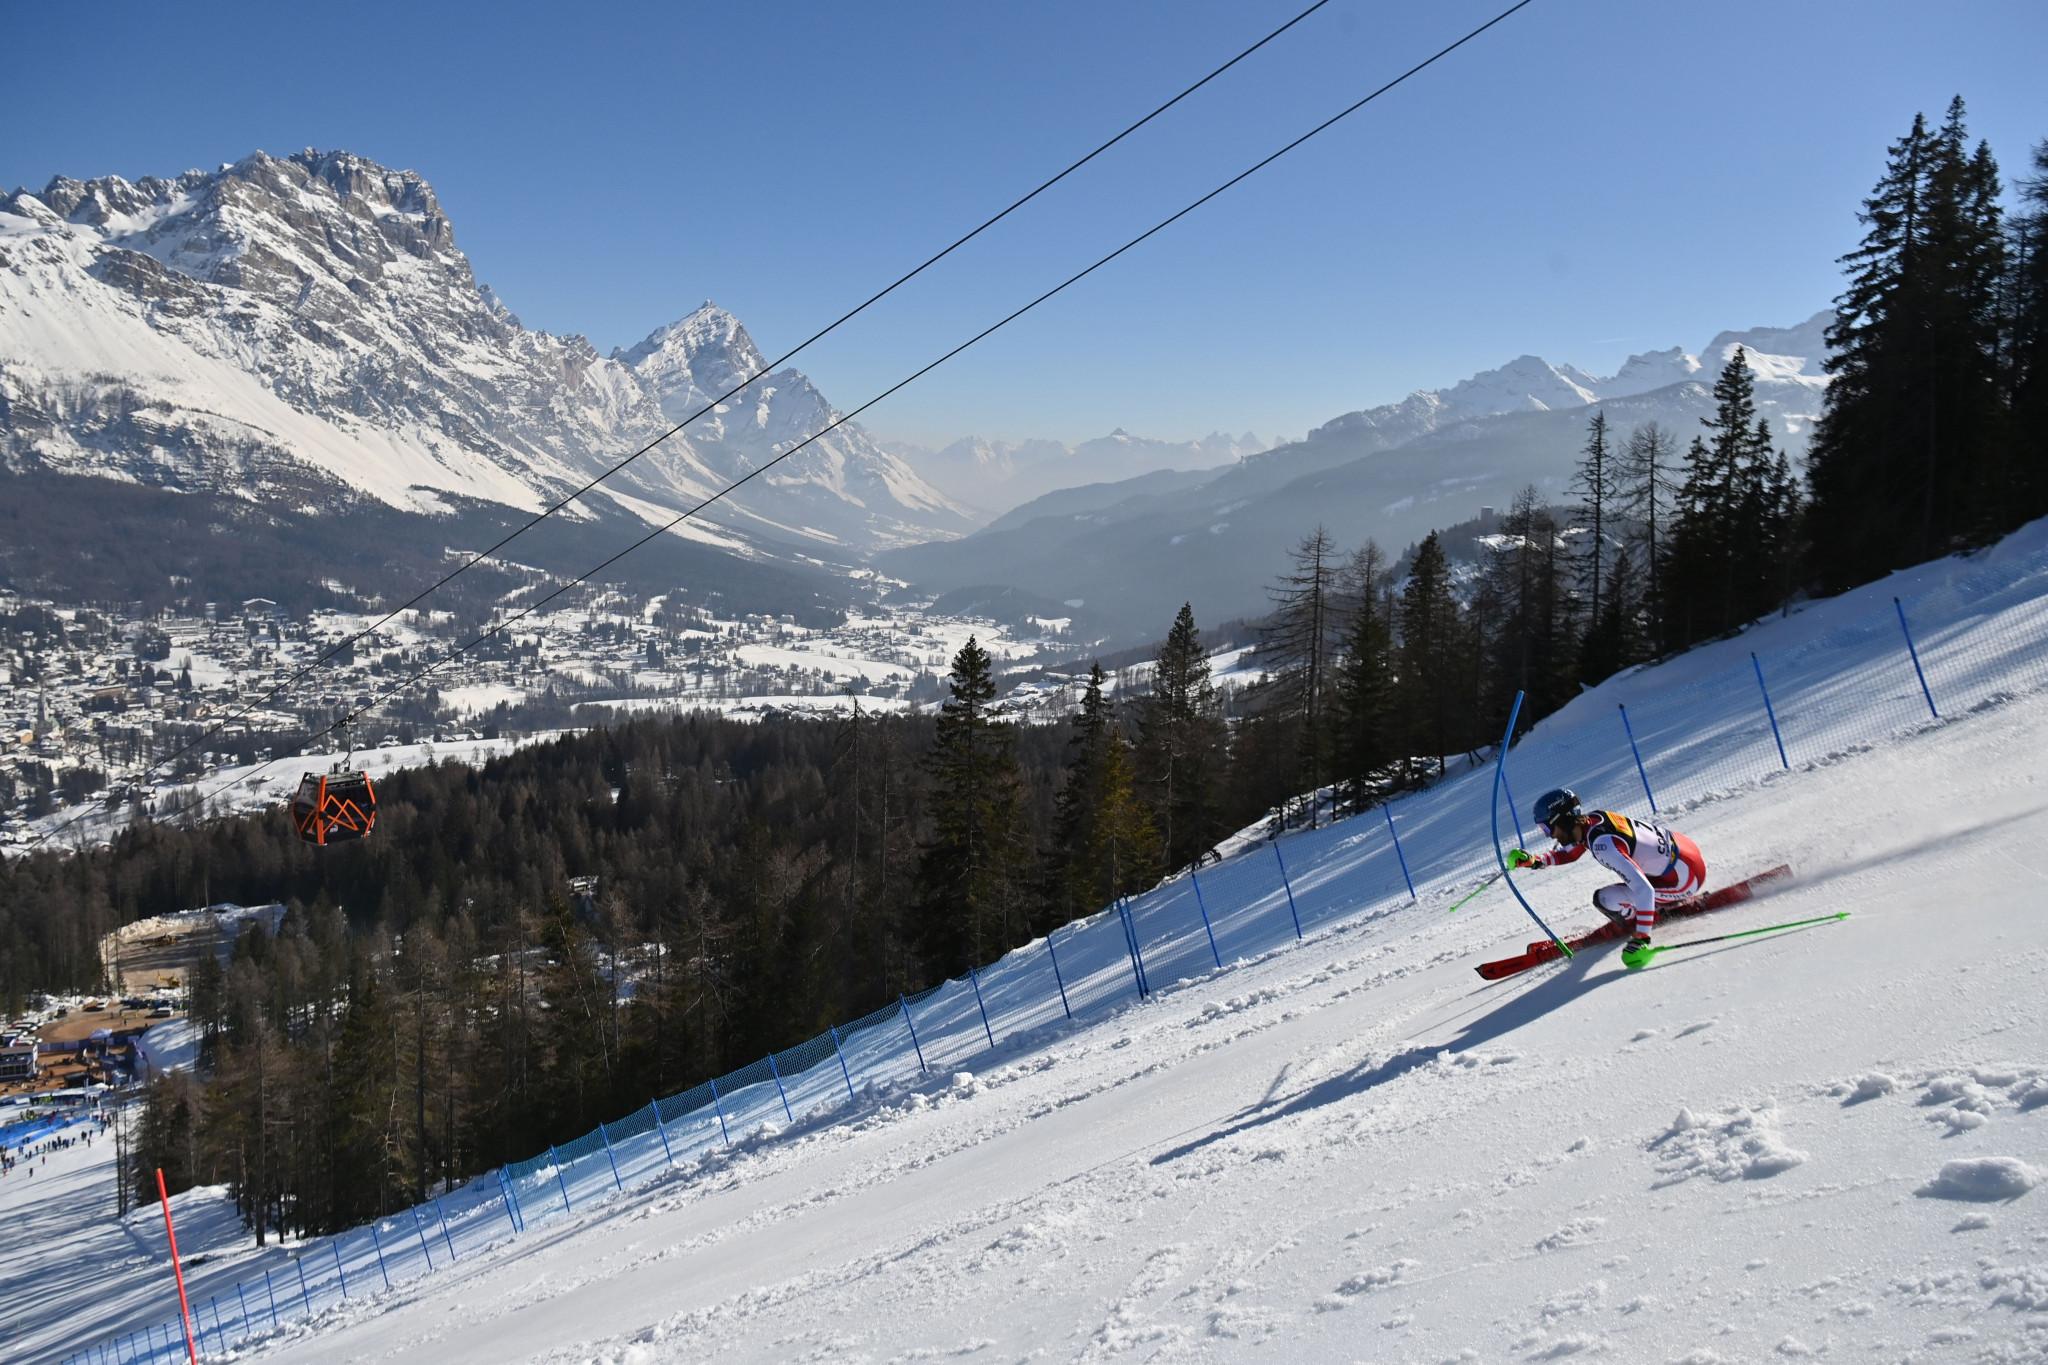 Cortina held this year's World Alpine Skiing Championships ©Getty Images